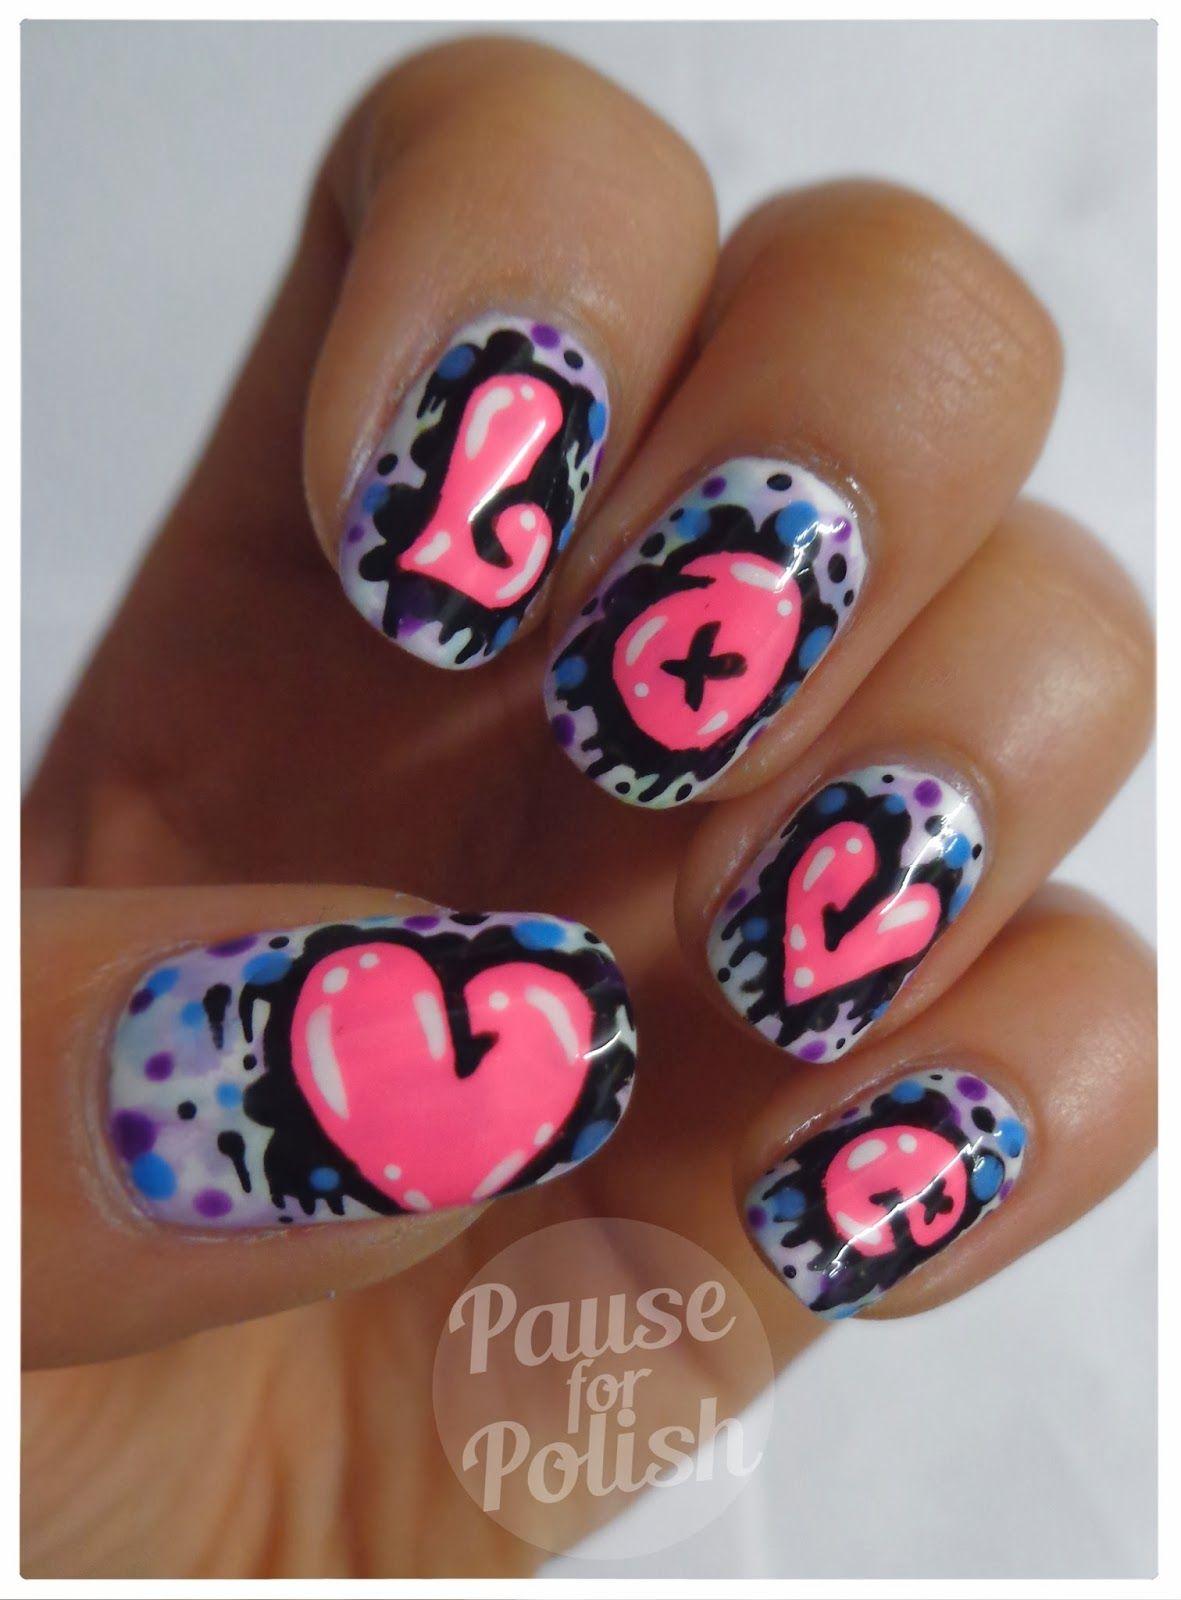 Pause For Polish Love Graffiti Neon Nail Art Nails Pinterest